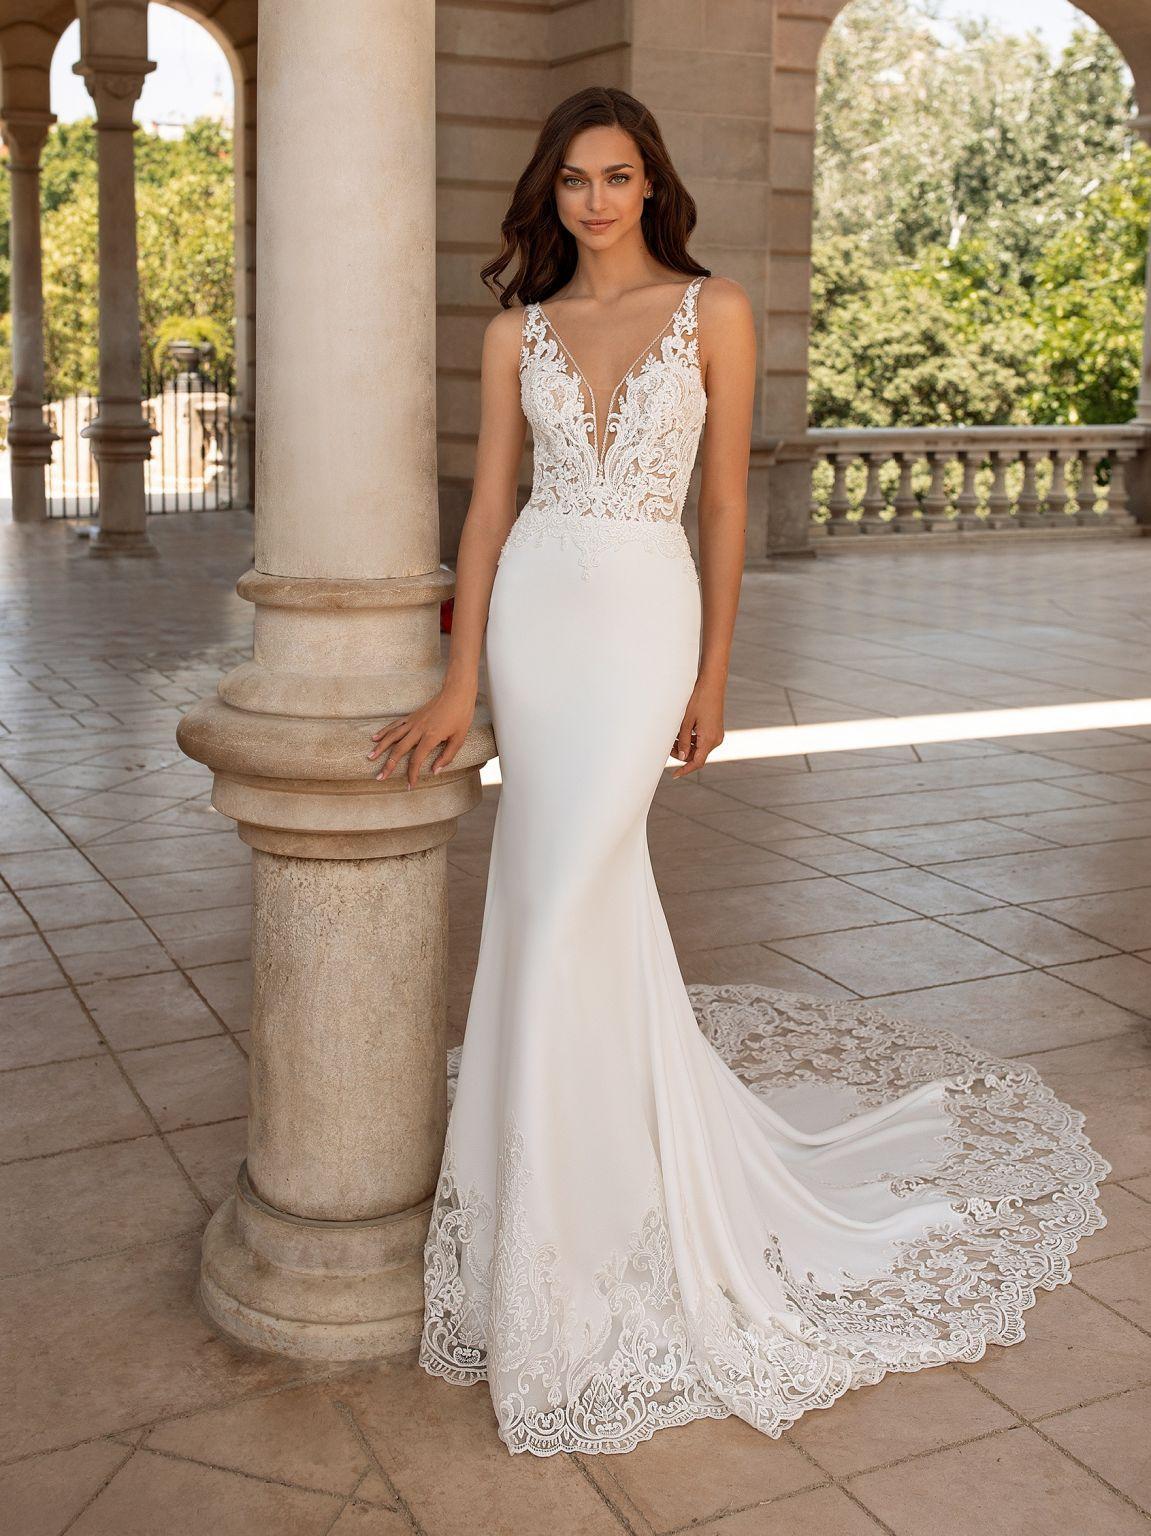 Pronovias Erandi Wedding Dress Used, Size 8, 1,800 in